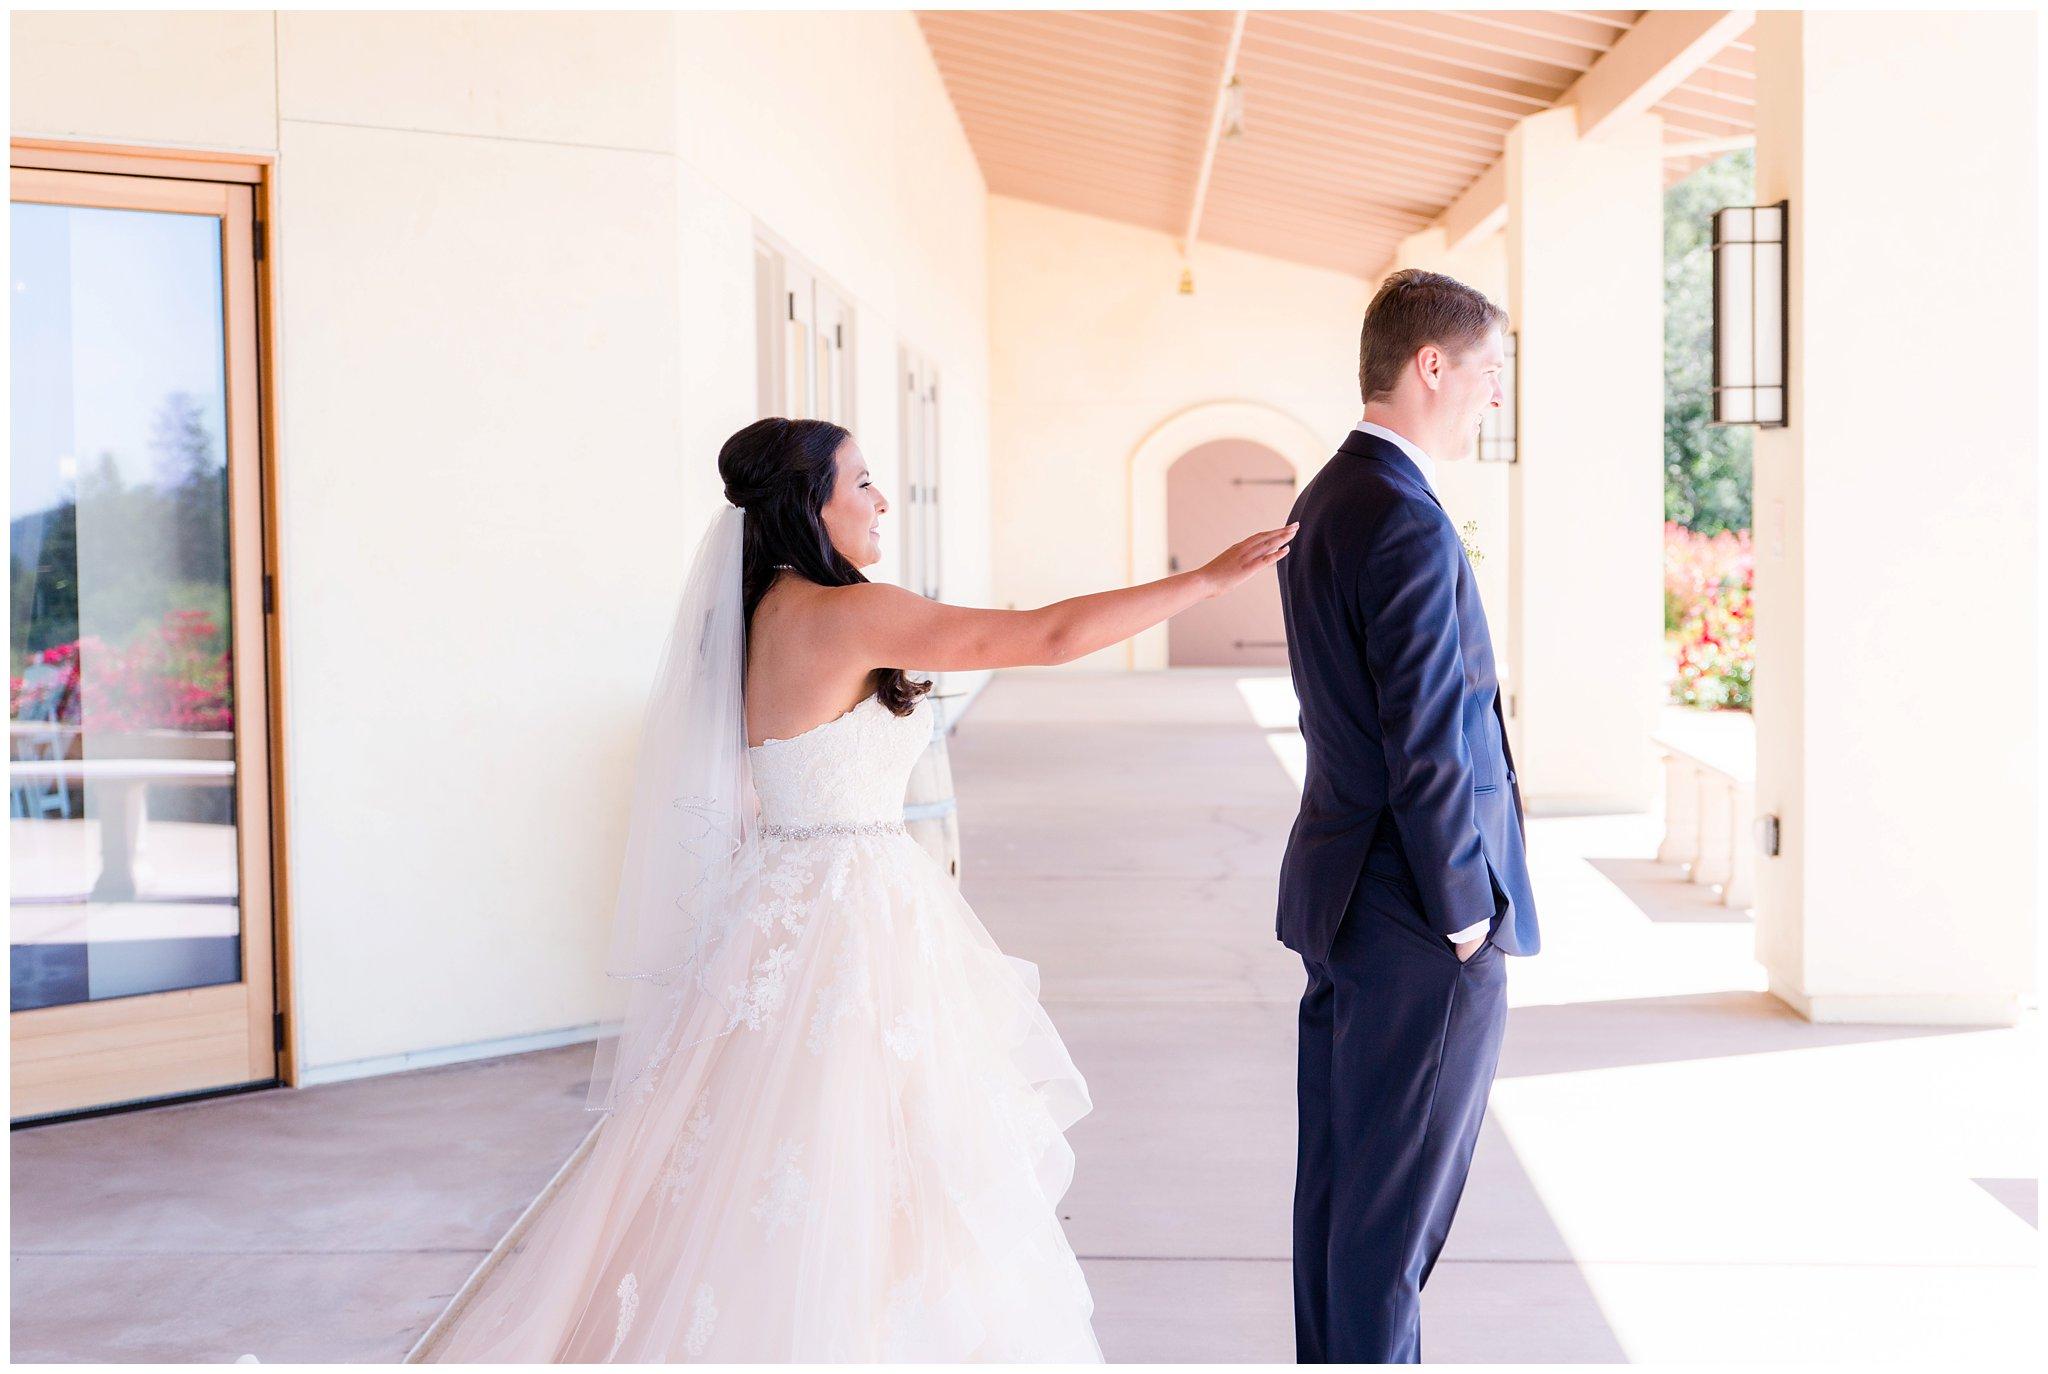 David-Girard-Vineyards-Wedding-Wedgewood-Weddings-23.jpg